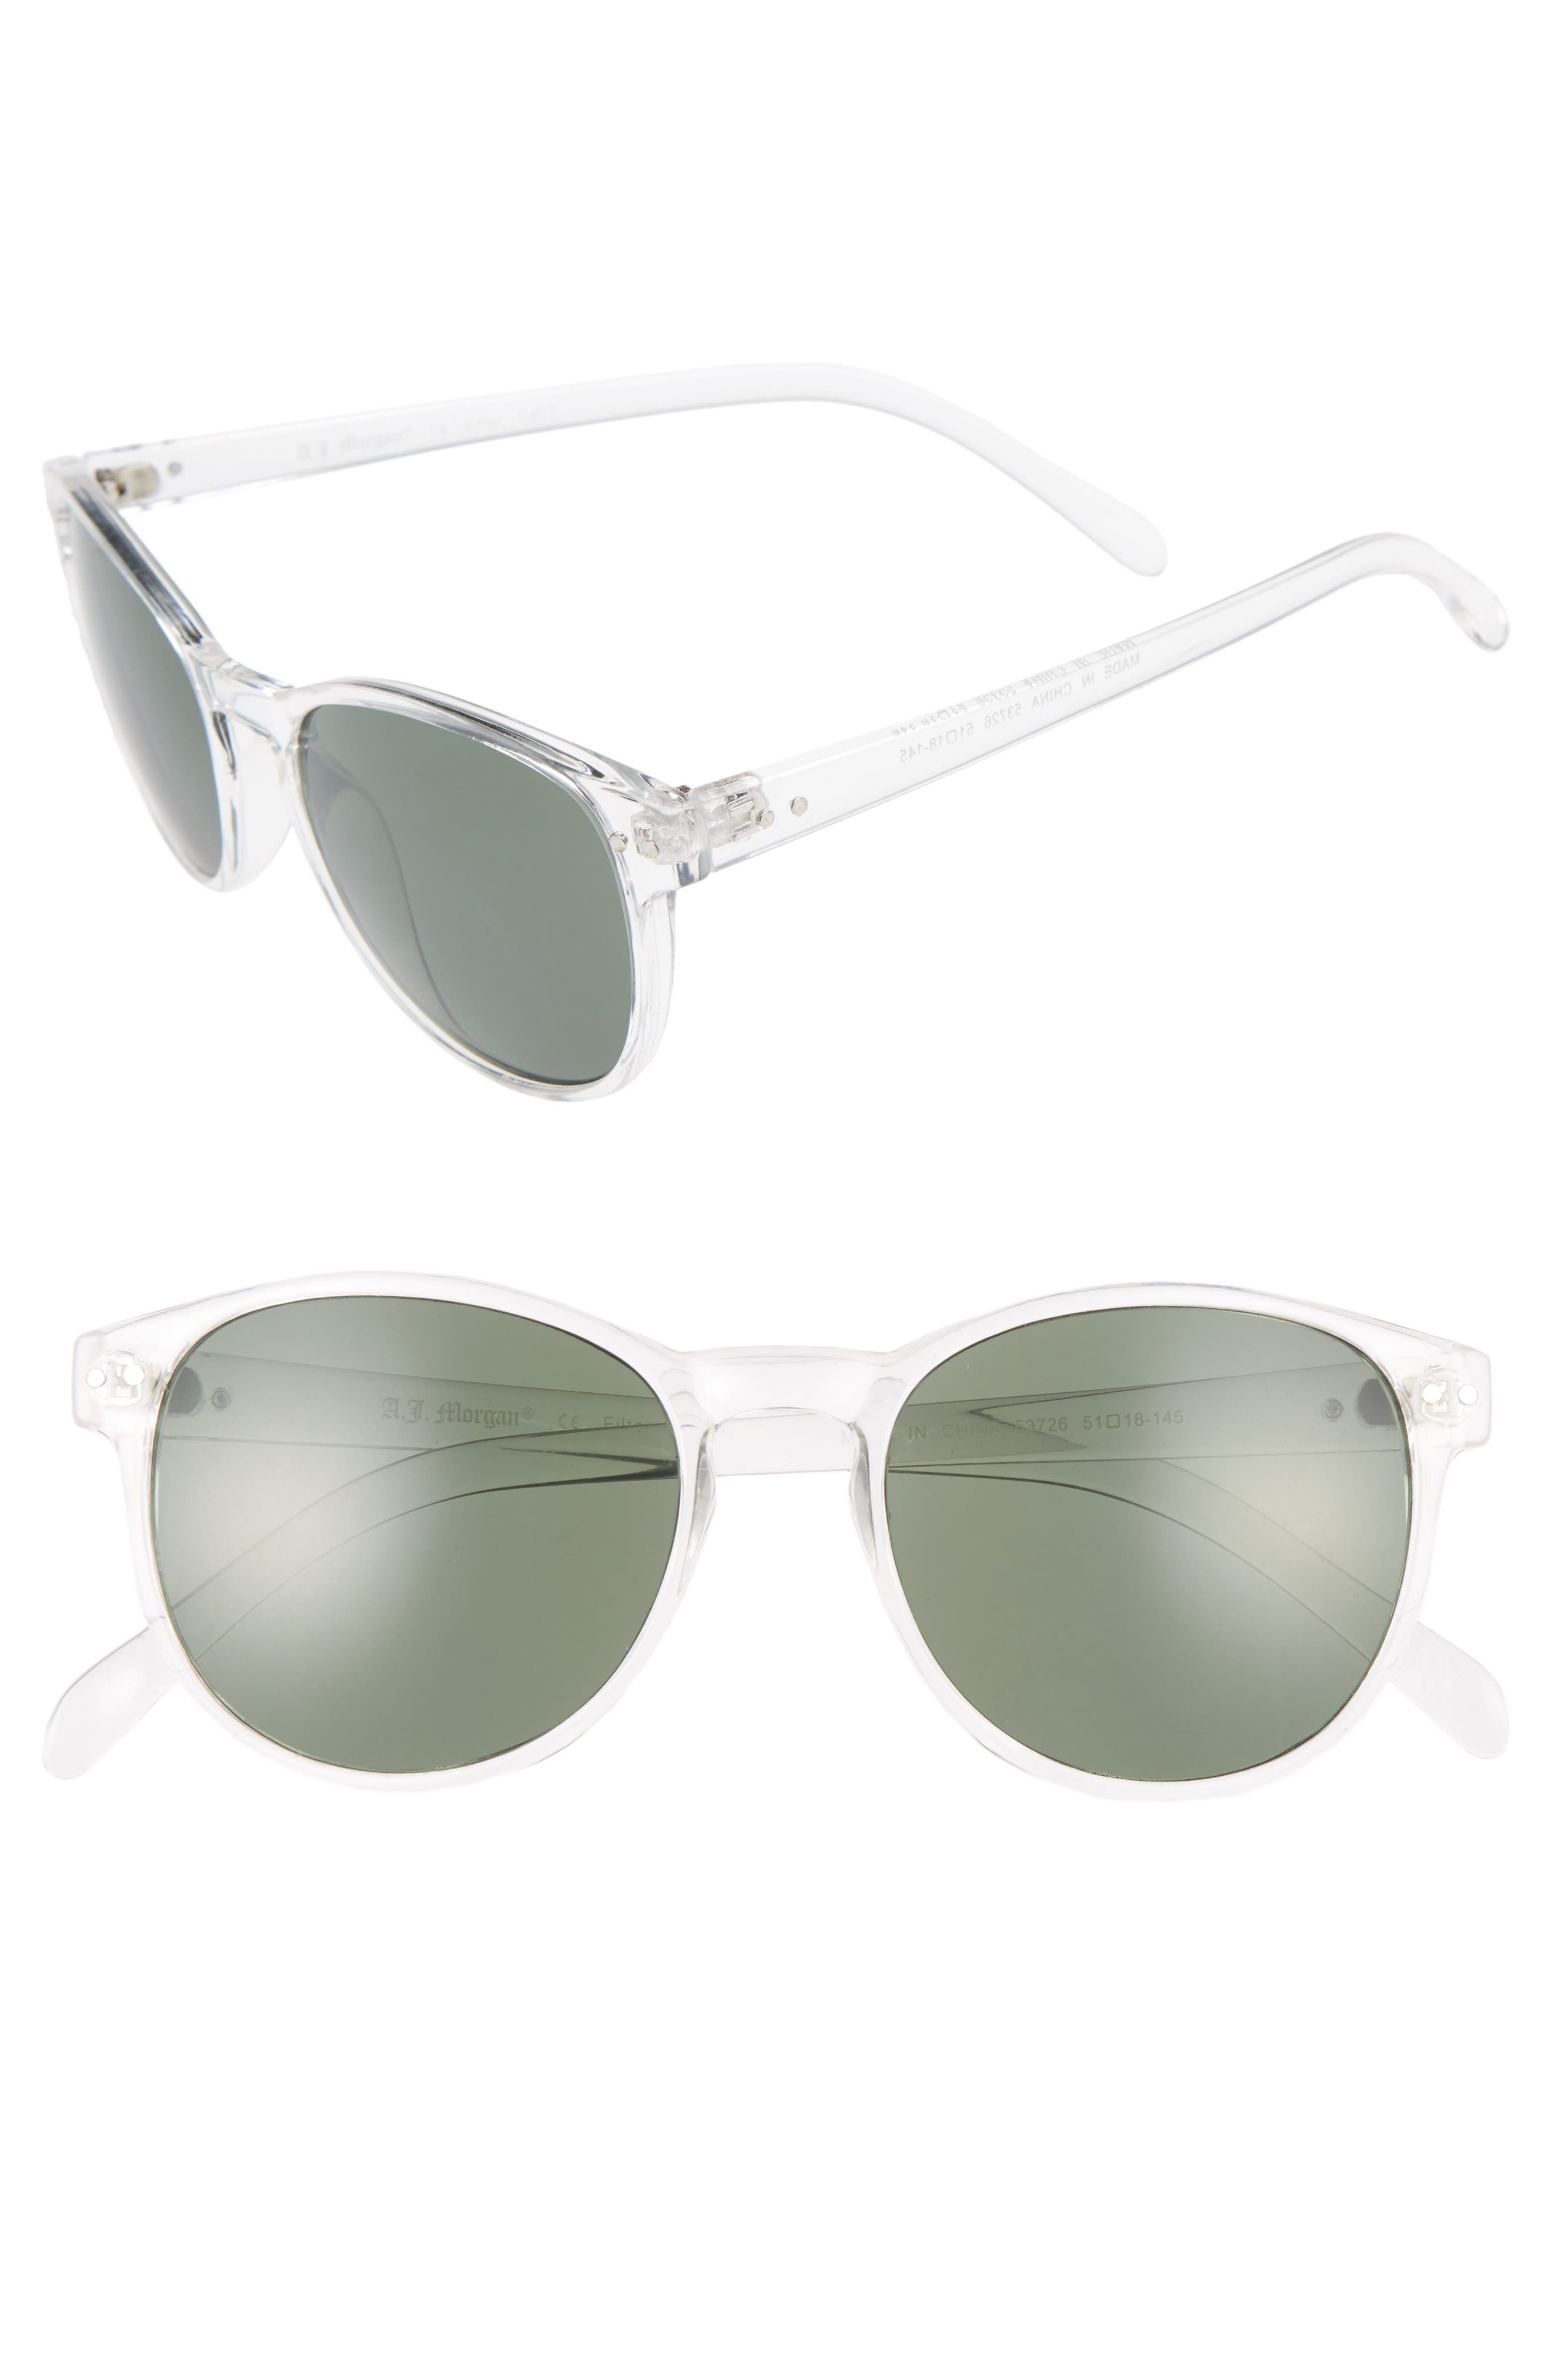 Main Image - A.J. Morgan Daily 57mm Sunglasses